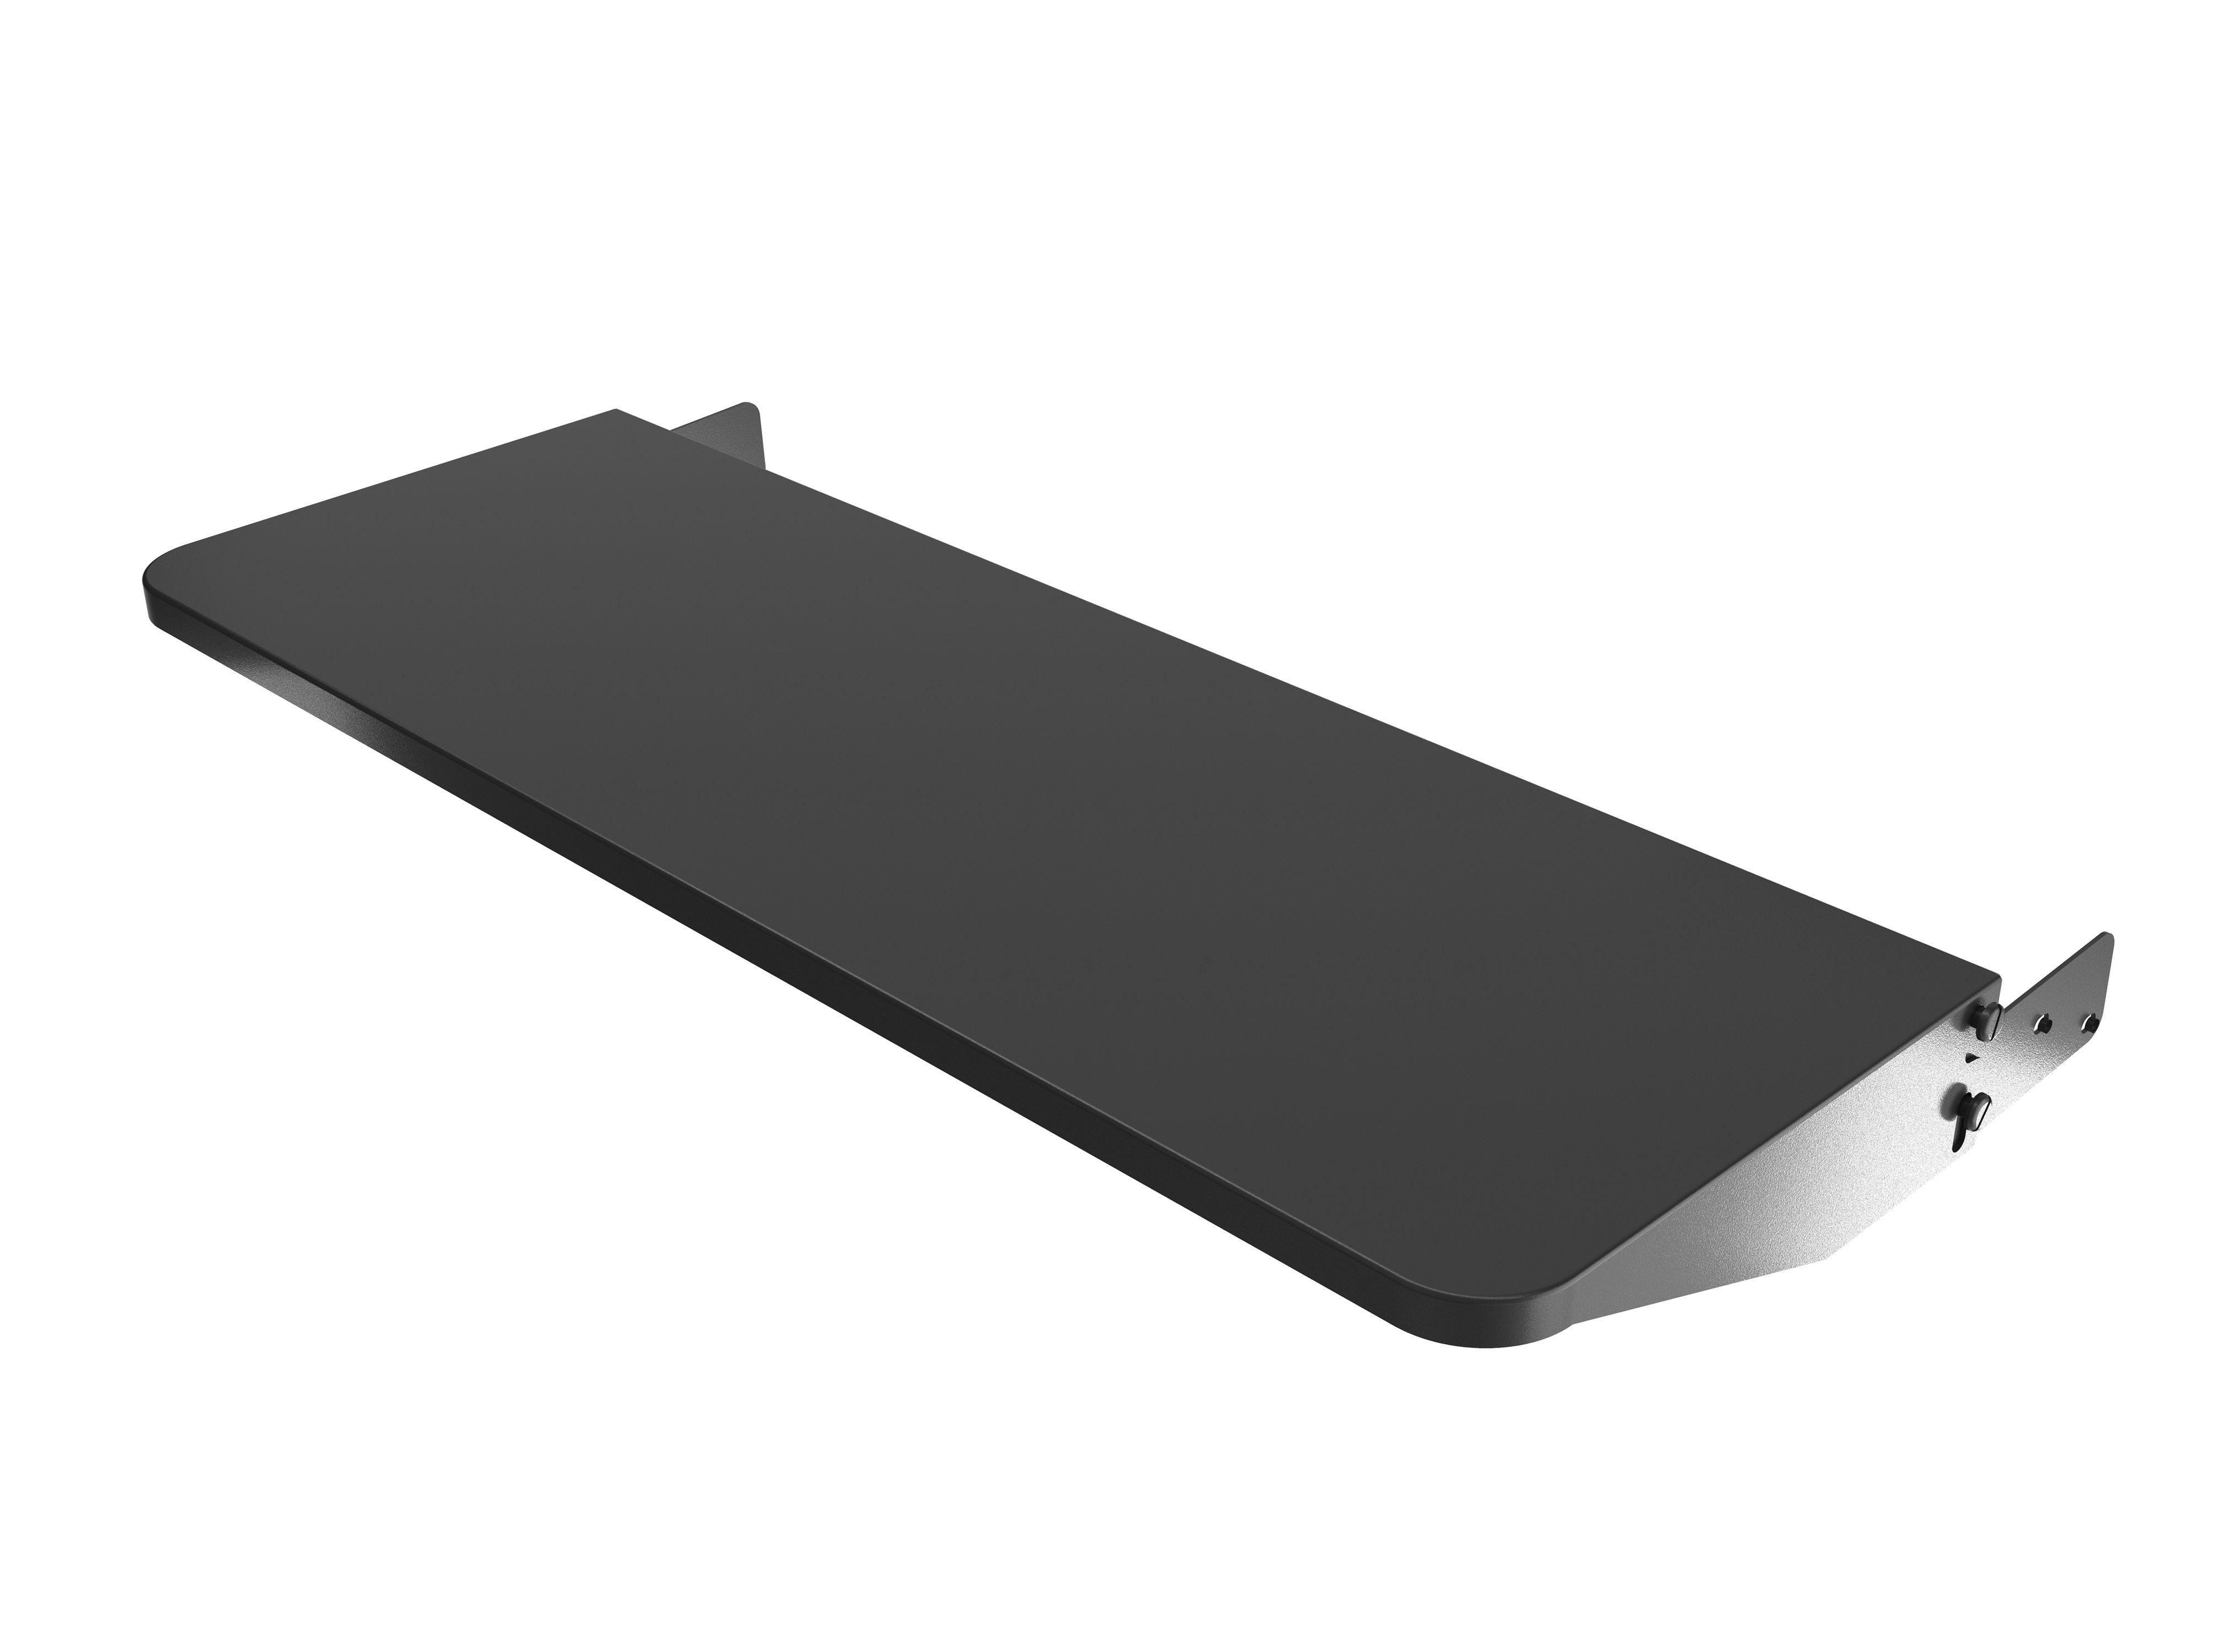 Traeger | Opklapbaar Werkblad | Ironwood 885, Pro 780, 30 Series